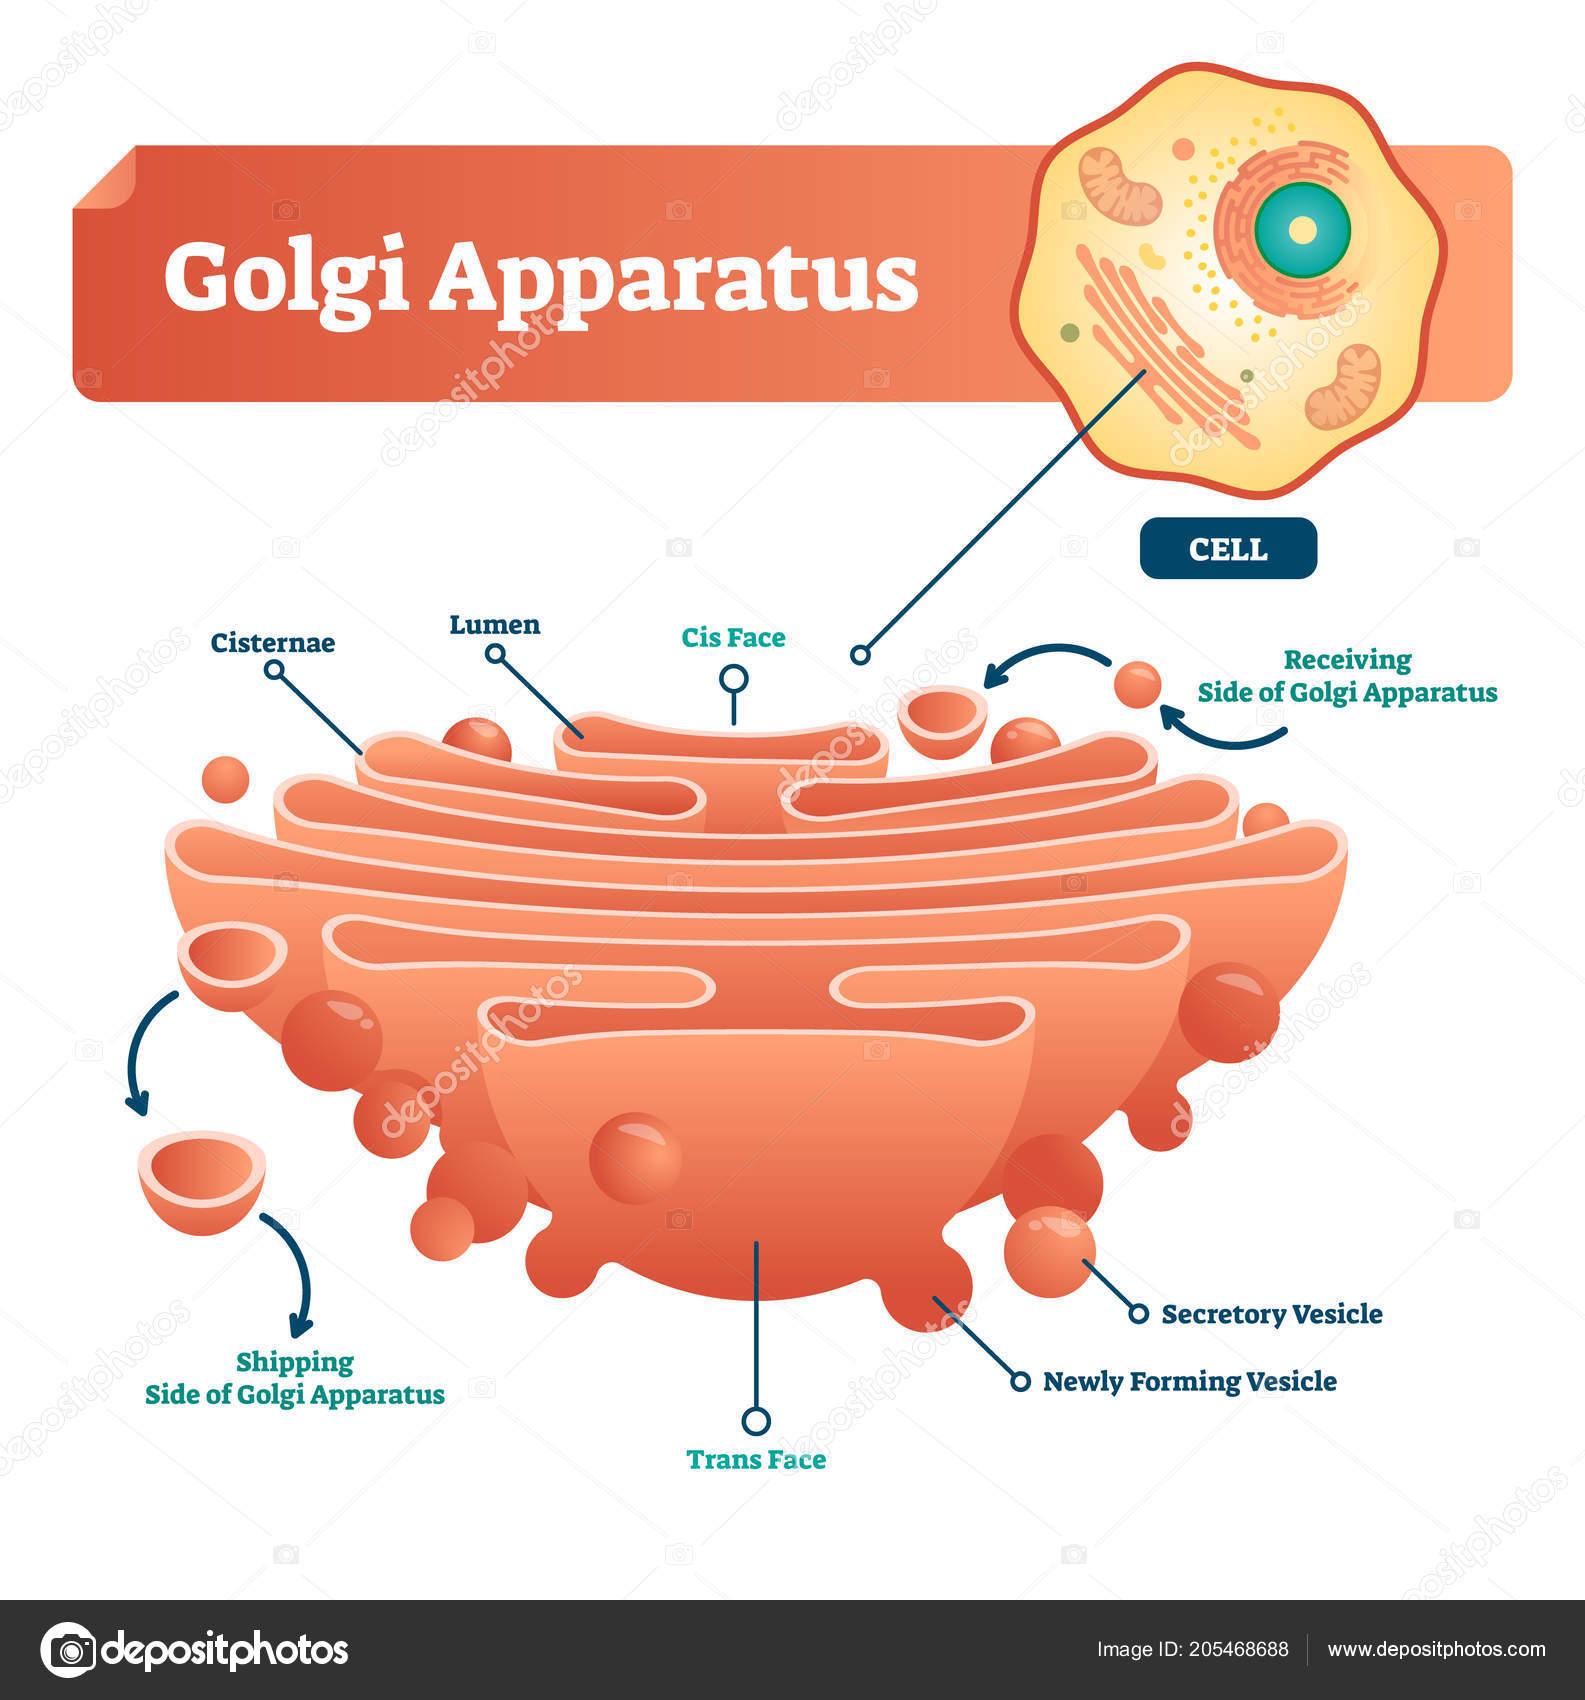 Golgi apparatus vector illustration labeled microscopic scheme with golgi apparatus vector illustration labeled microscopic scheme with cisternae lumen secretory and newly ccuart Choice Image